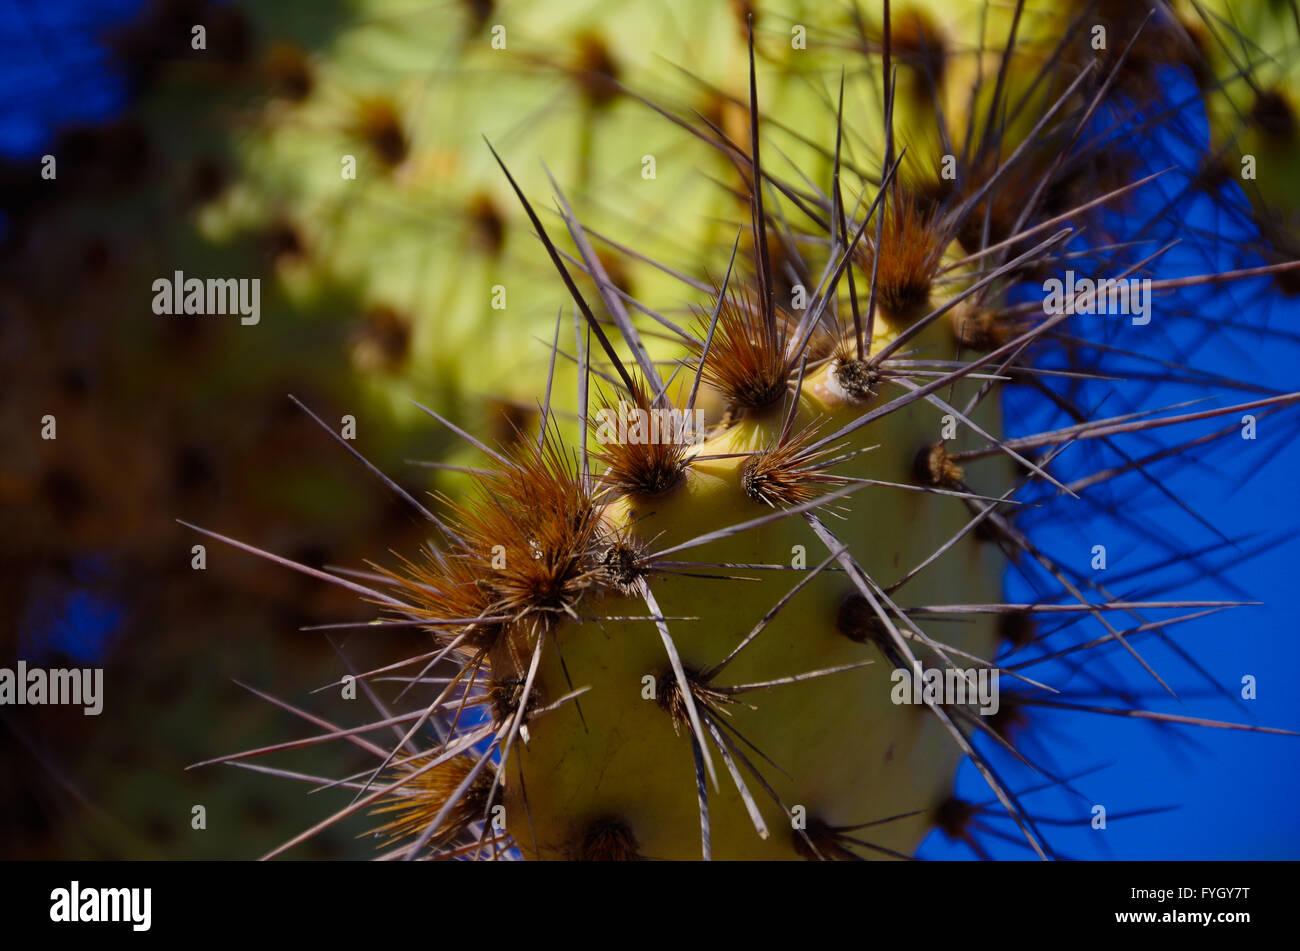 Closeup of cactus spines - Stock Image